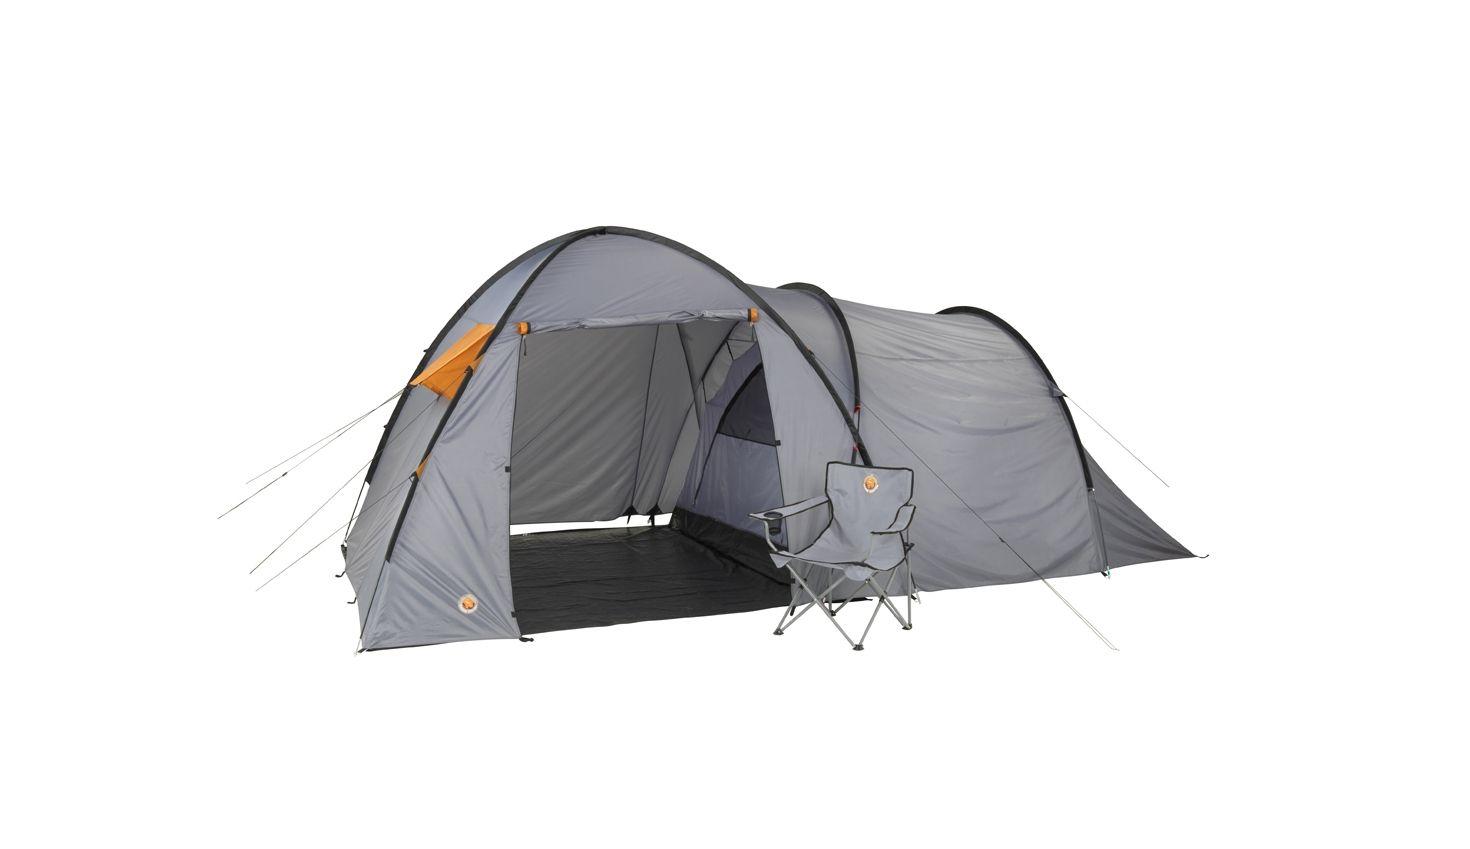 Camping Zelte Der Outdoorprofi